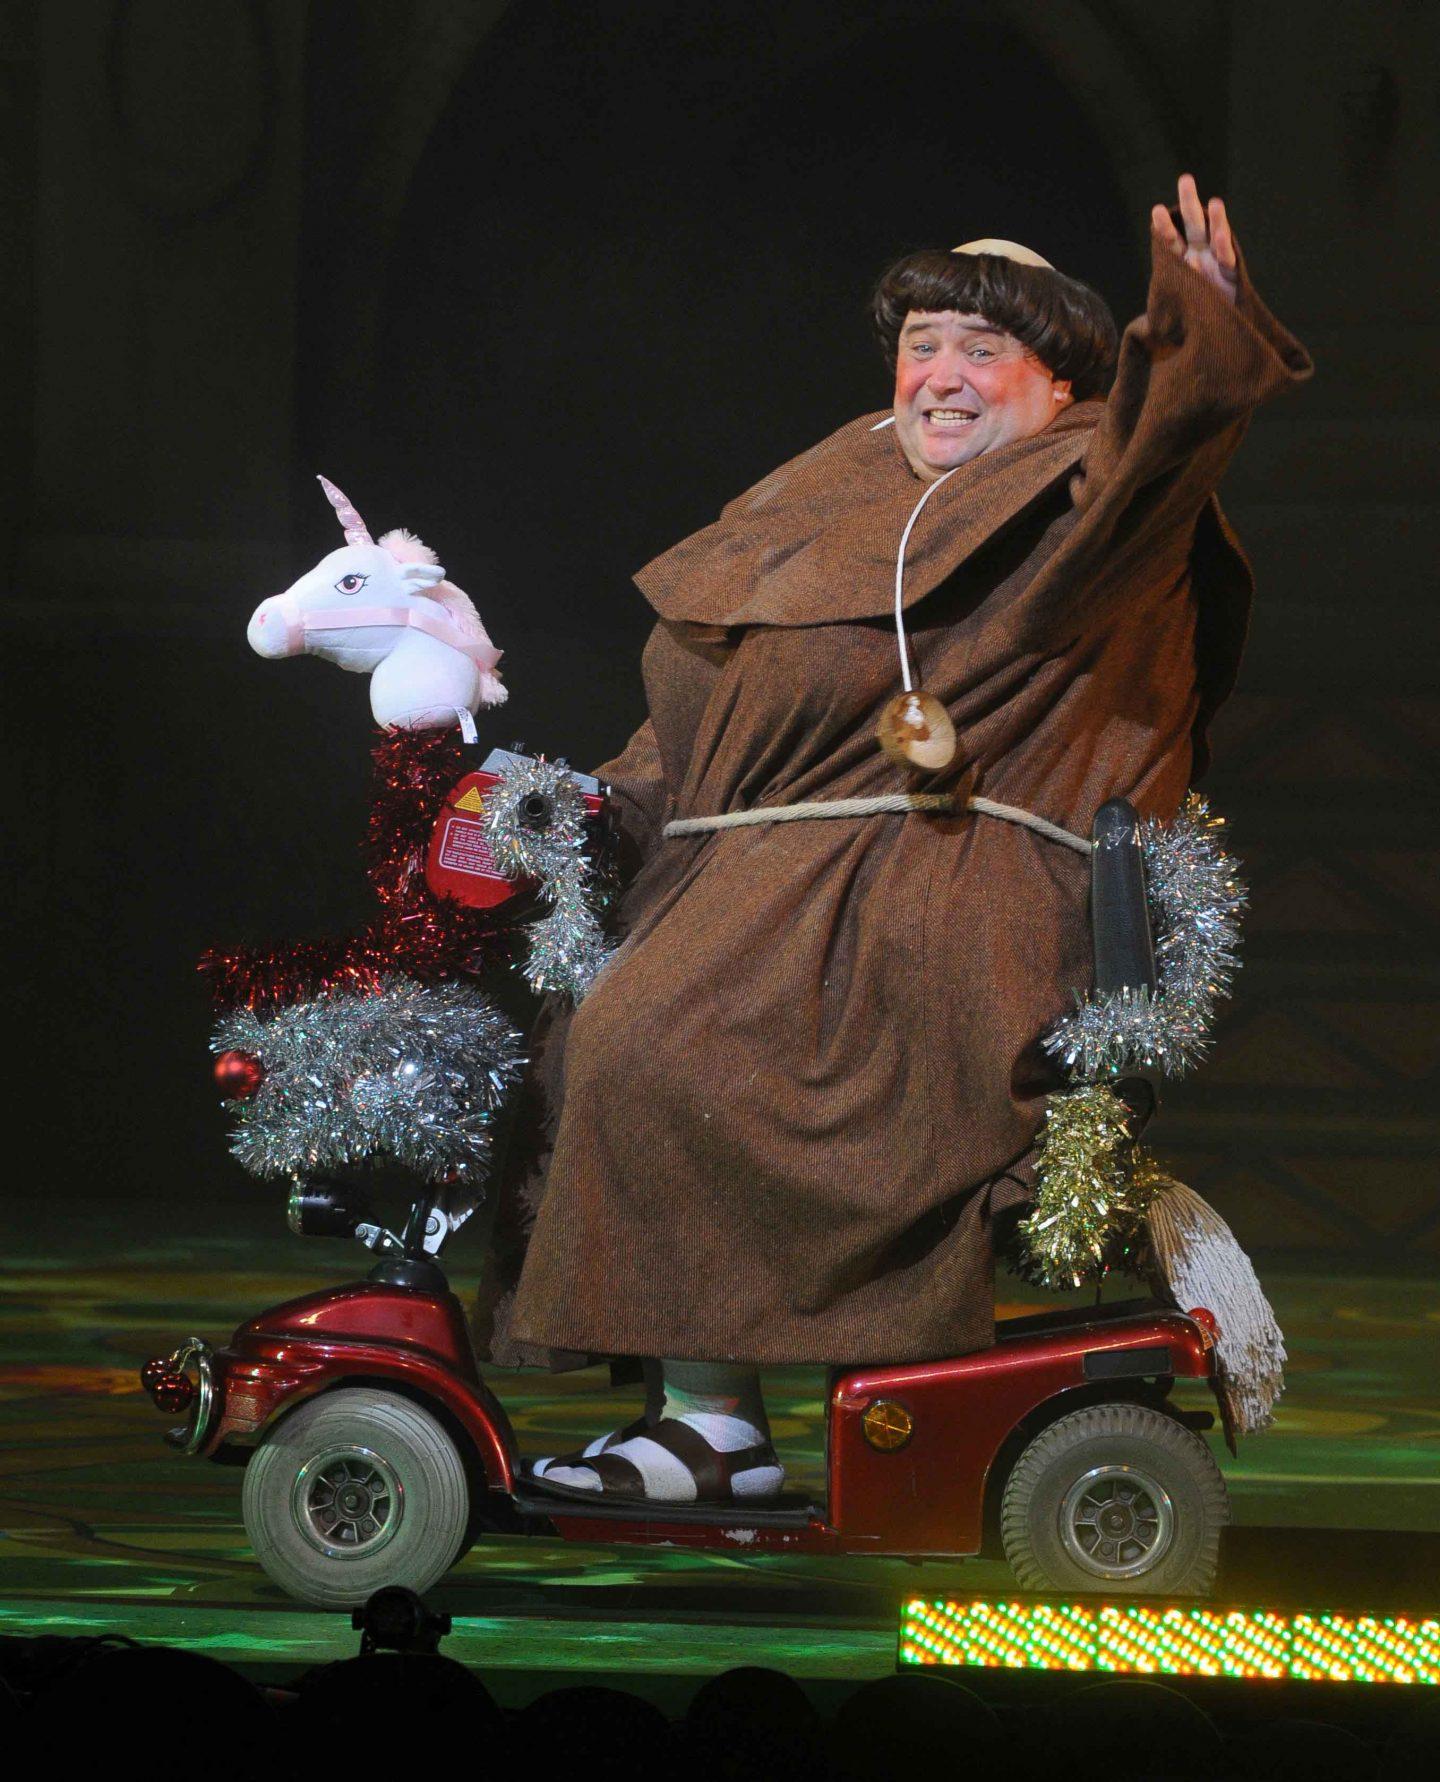 robin-hood-pantoregent-theatre-stoke-on-trent-blogger-press-night-review-christian